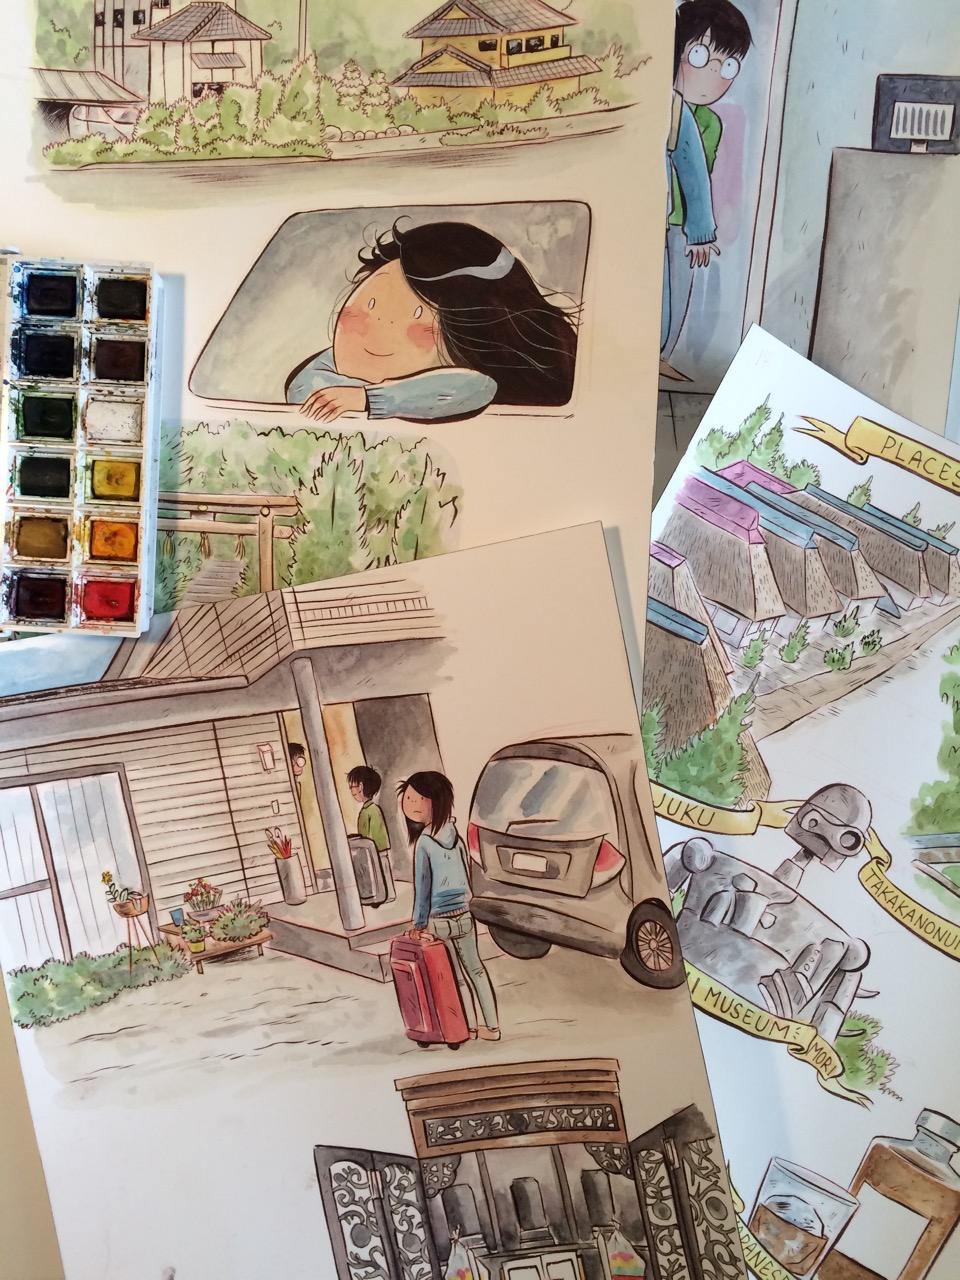 Tadaima by Emi Lenox (Image Comics)